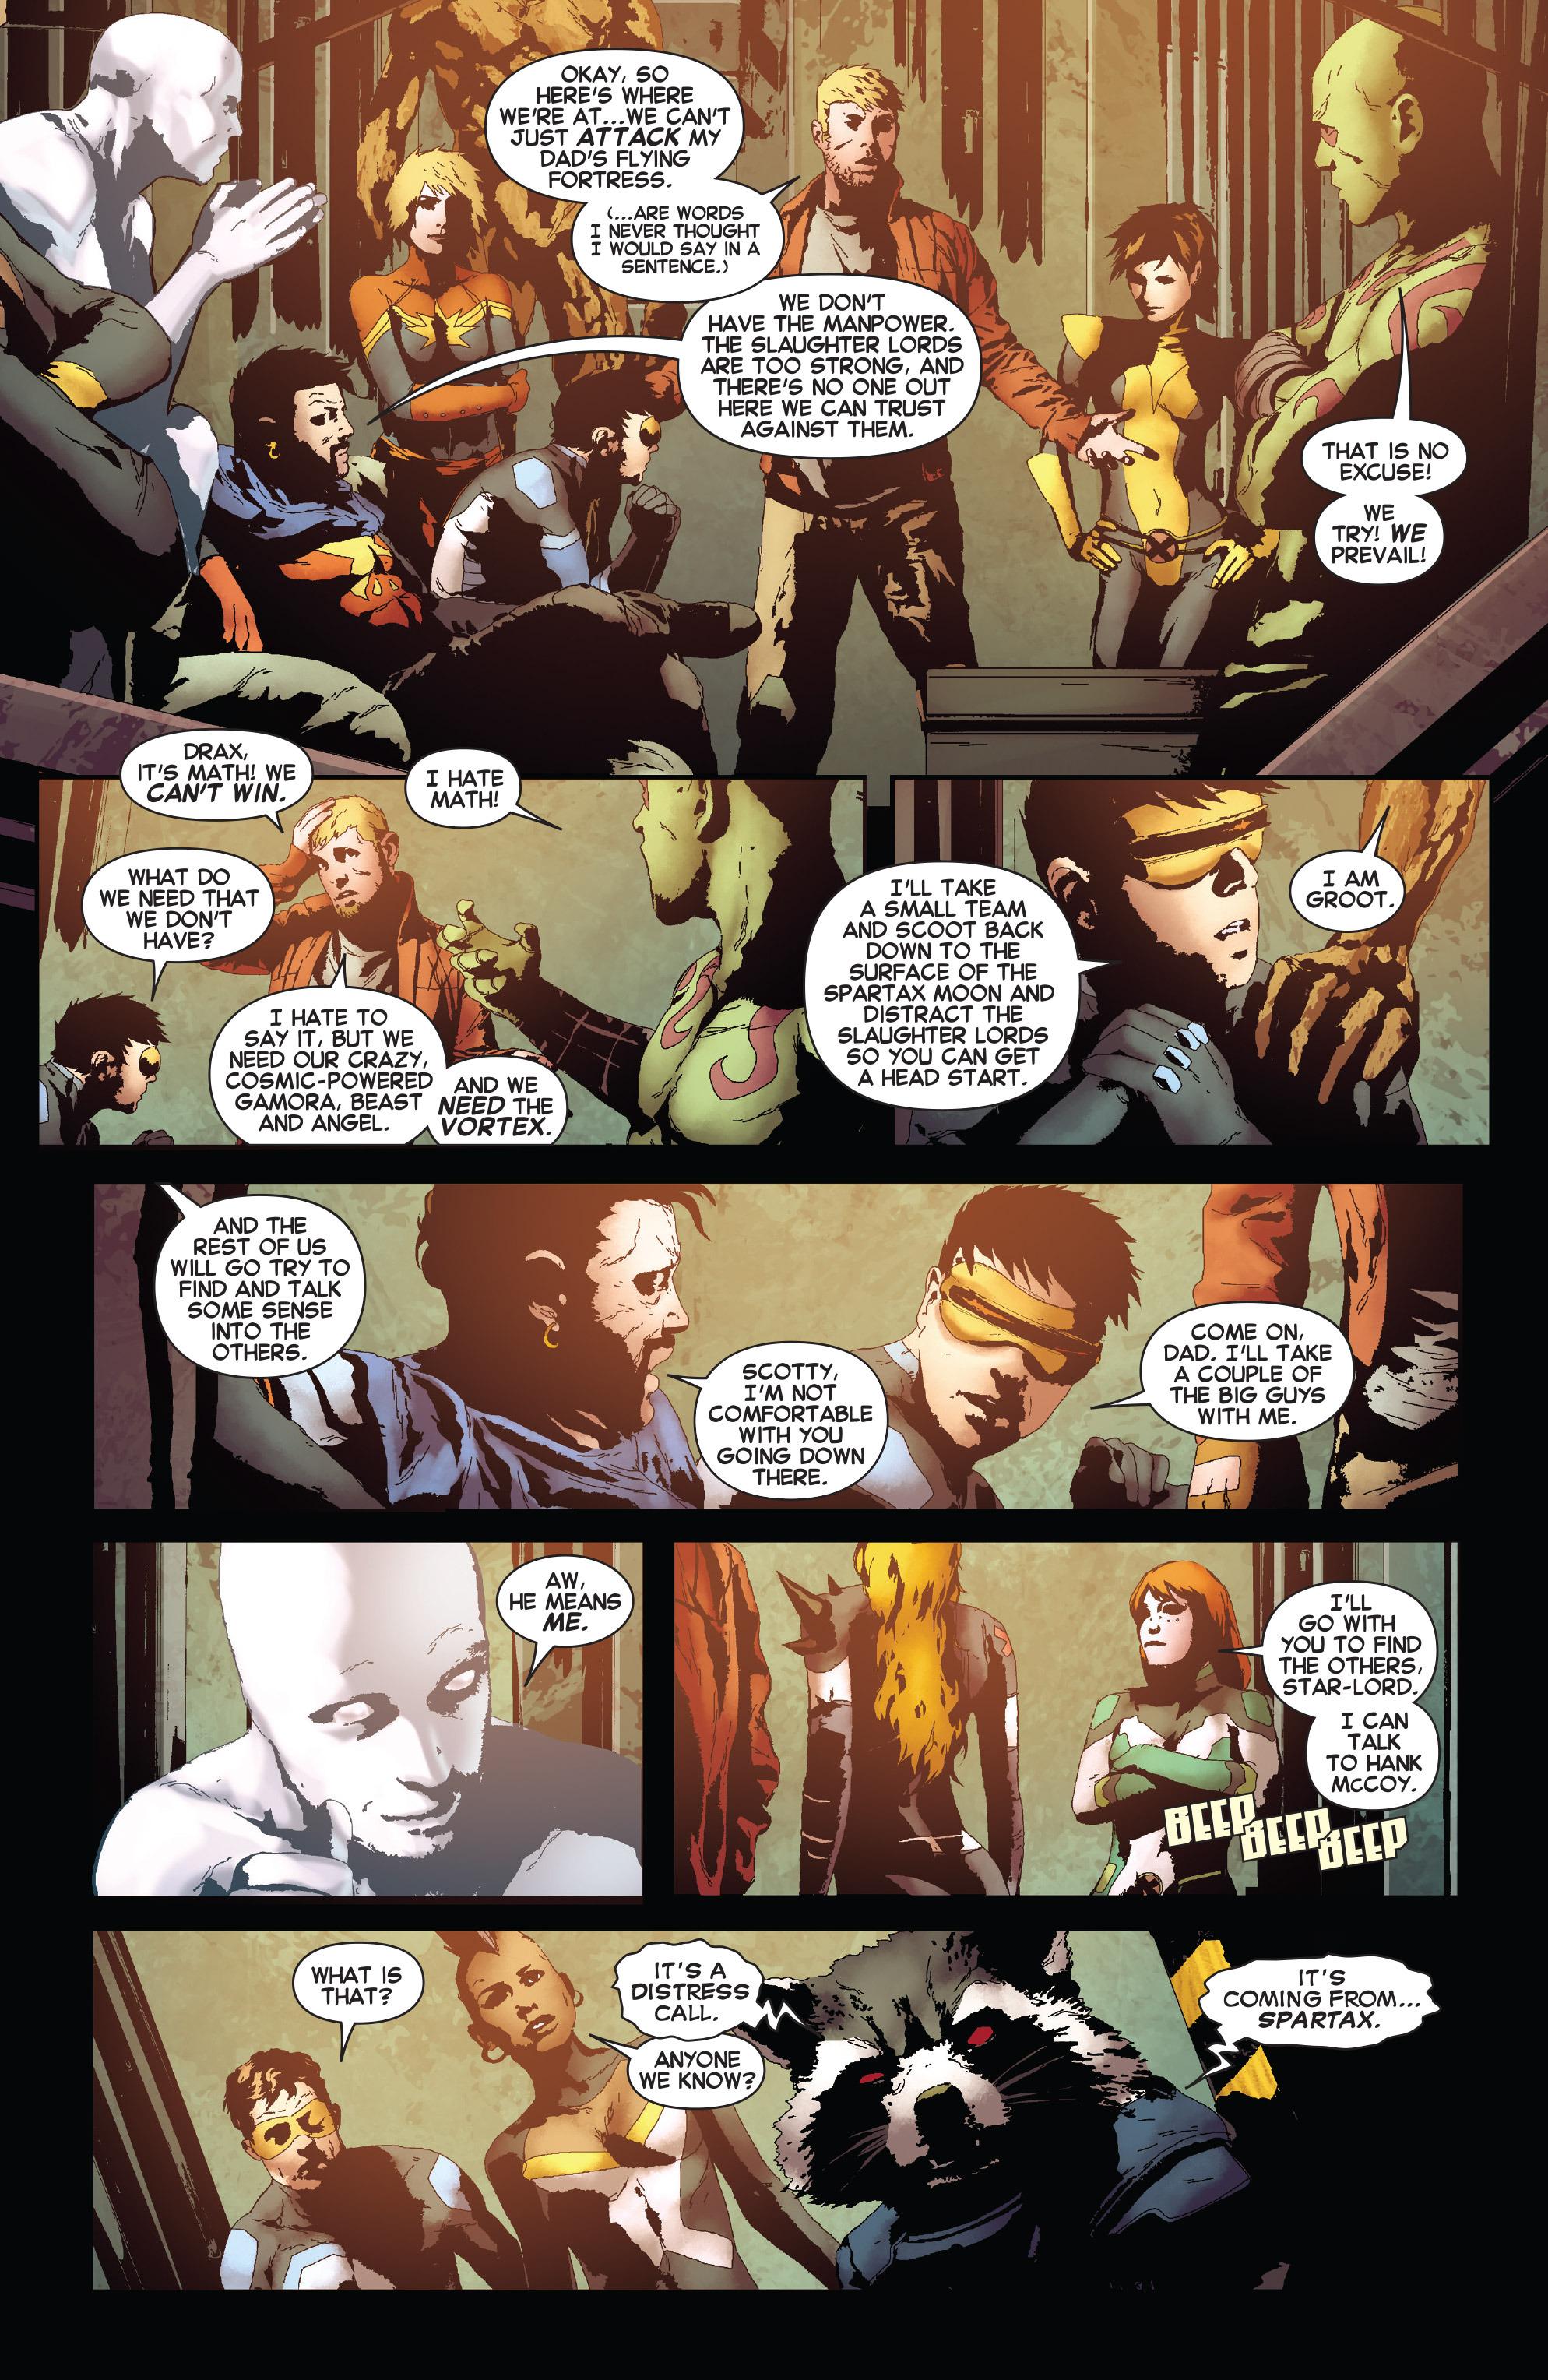 All-New X-Men (2013) chap 39 pic 12